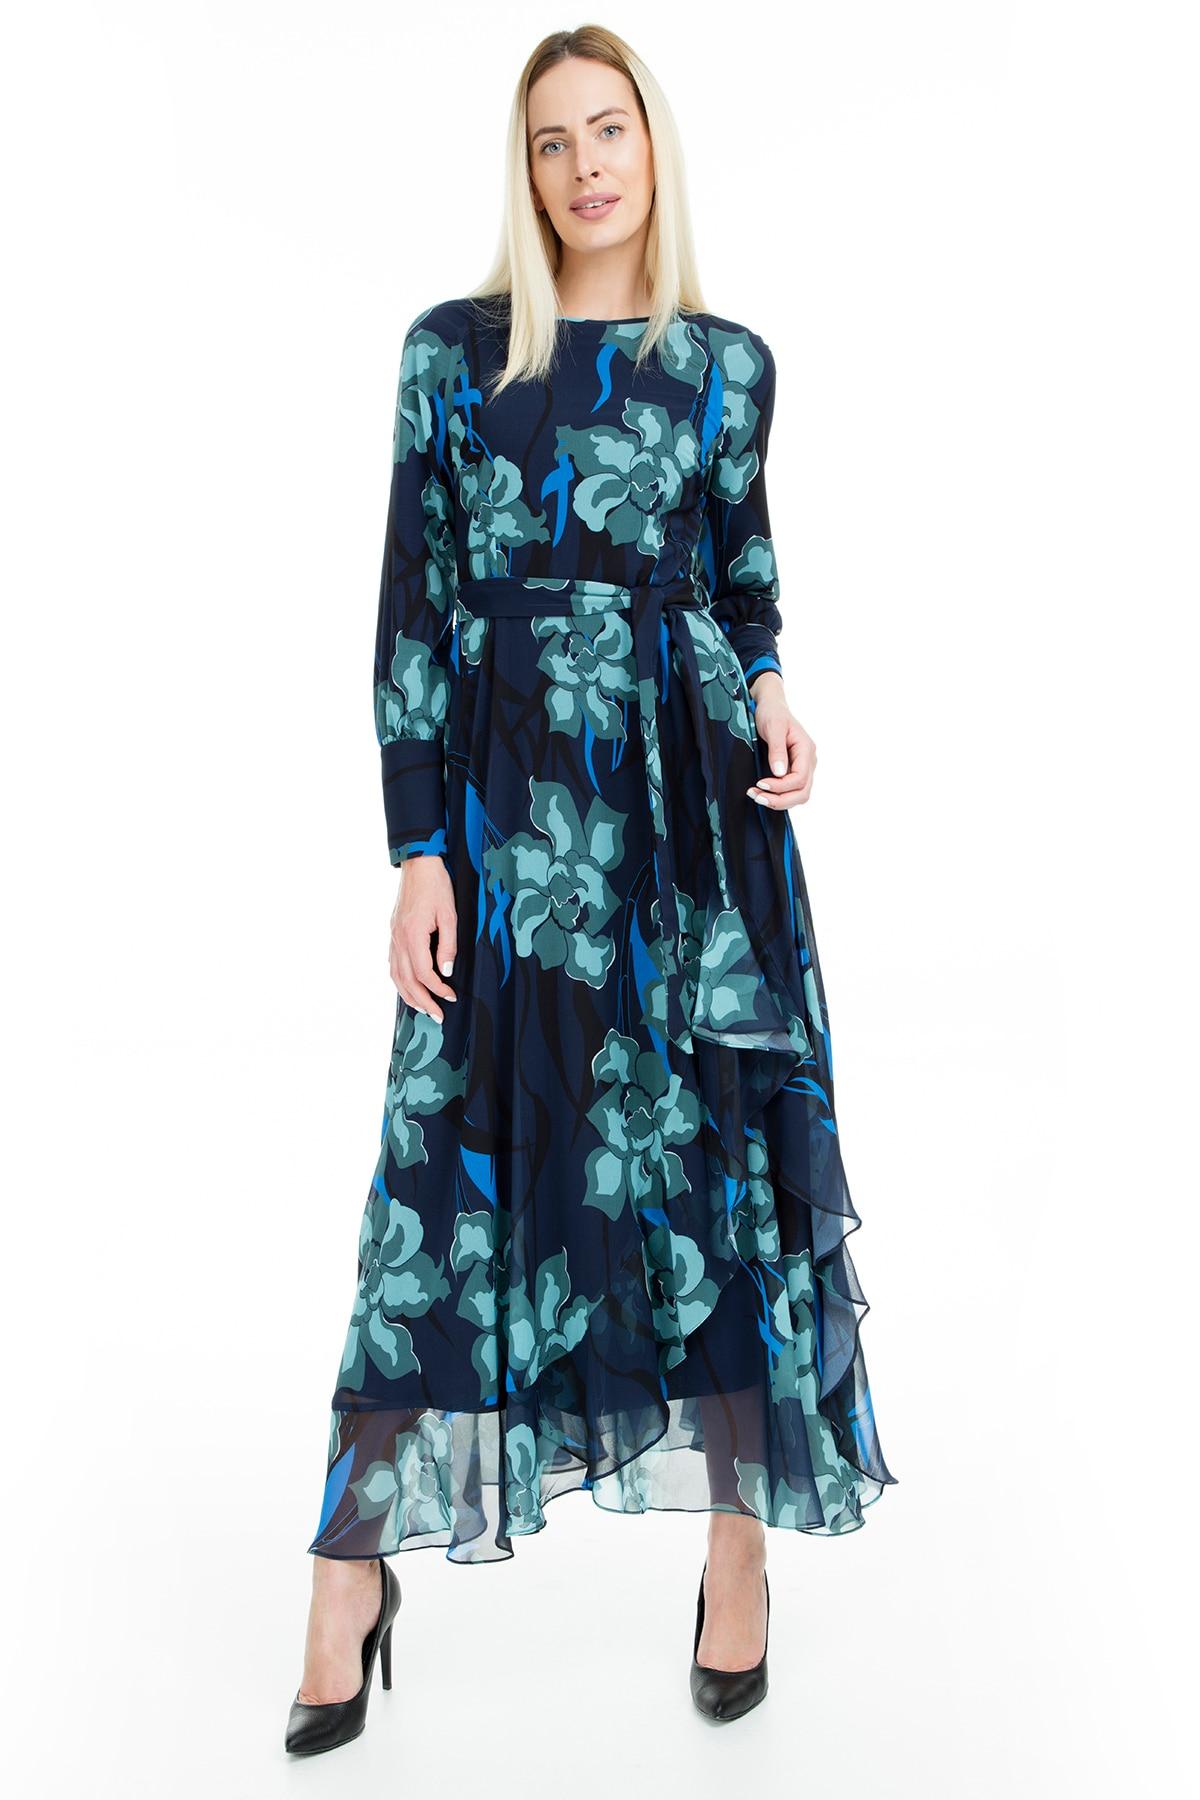 Via Dante Flower Print Dress WOMEN DRESS 1033555VD